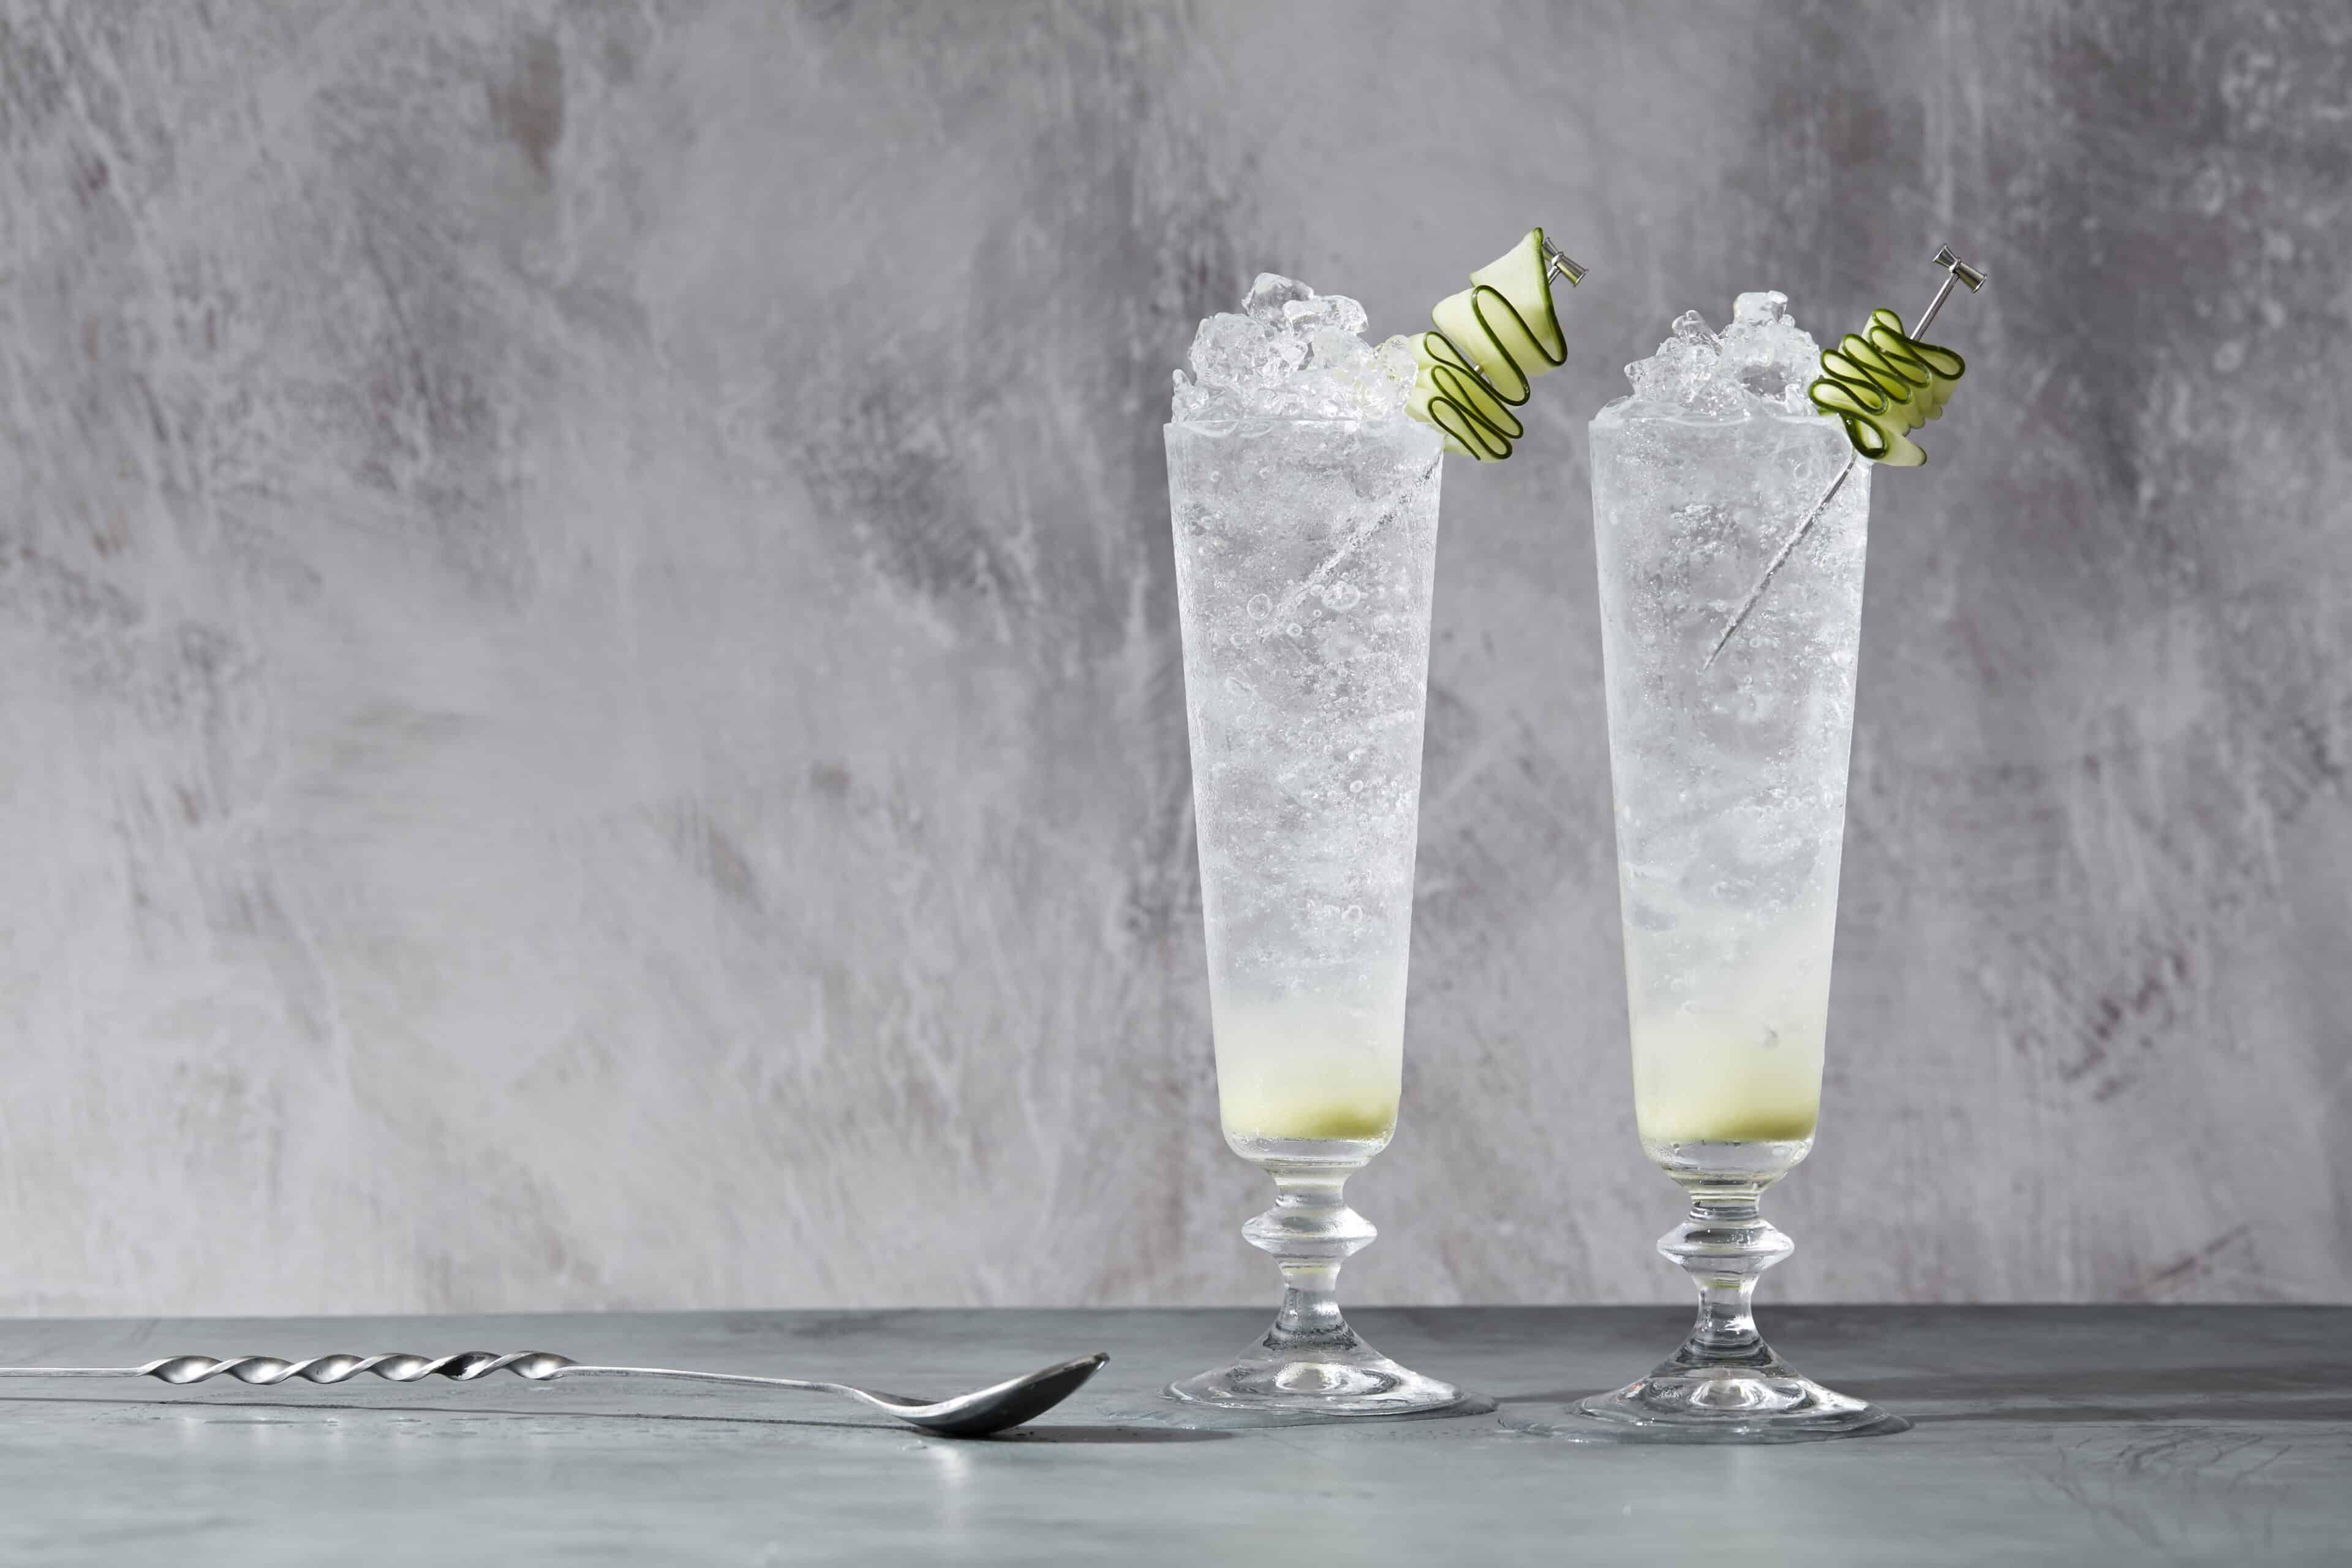 Specialty Cocktail, Cucumber Daquiri